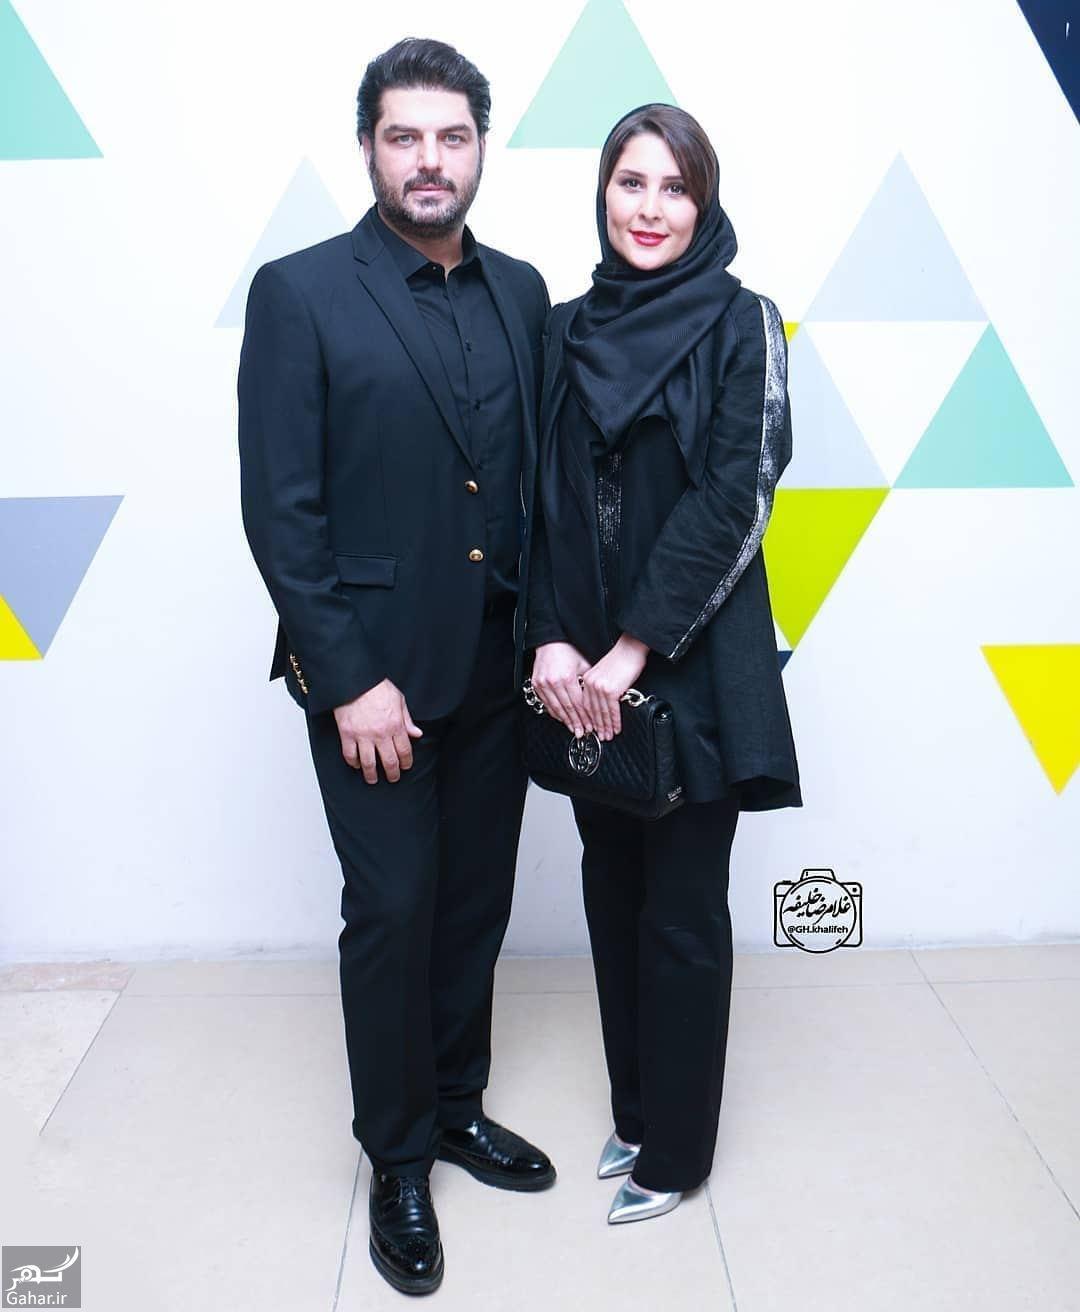 419182 Gahar ir عکس های جدید سام درخشانی و همسرش در اکران خصوصی  دشمن زن